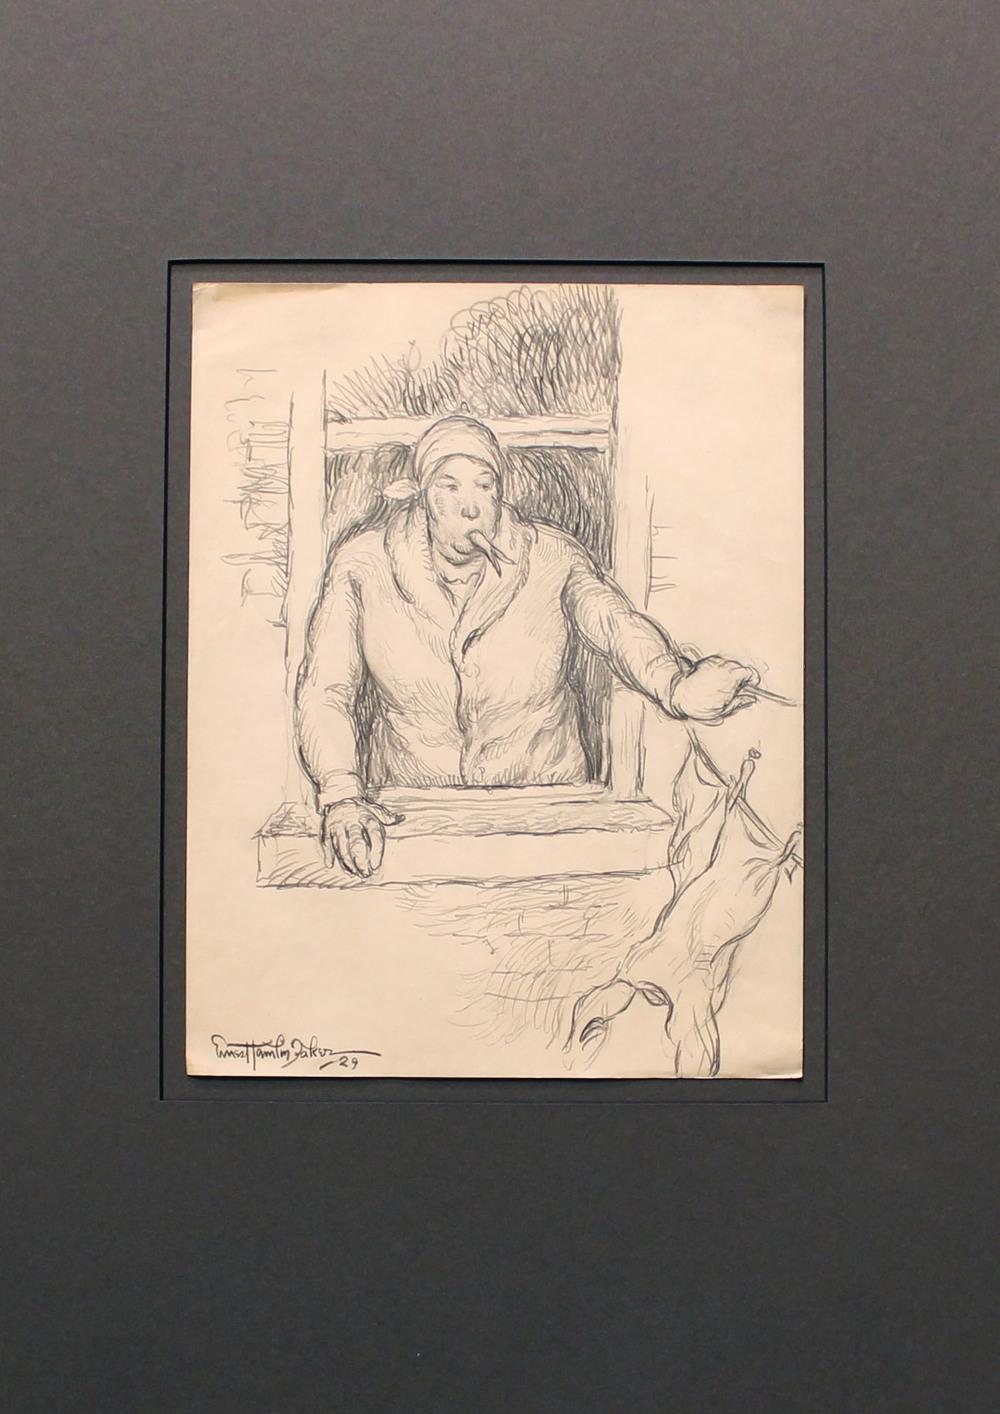 Laundry Day 1929 Baker Sketch Drawing 11x8.5 um, 20x15 m.jpg